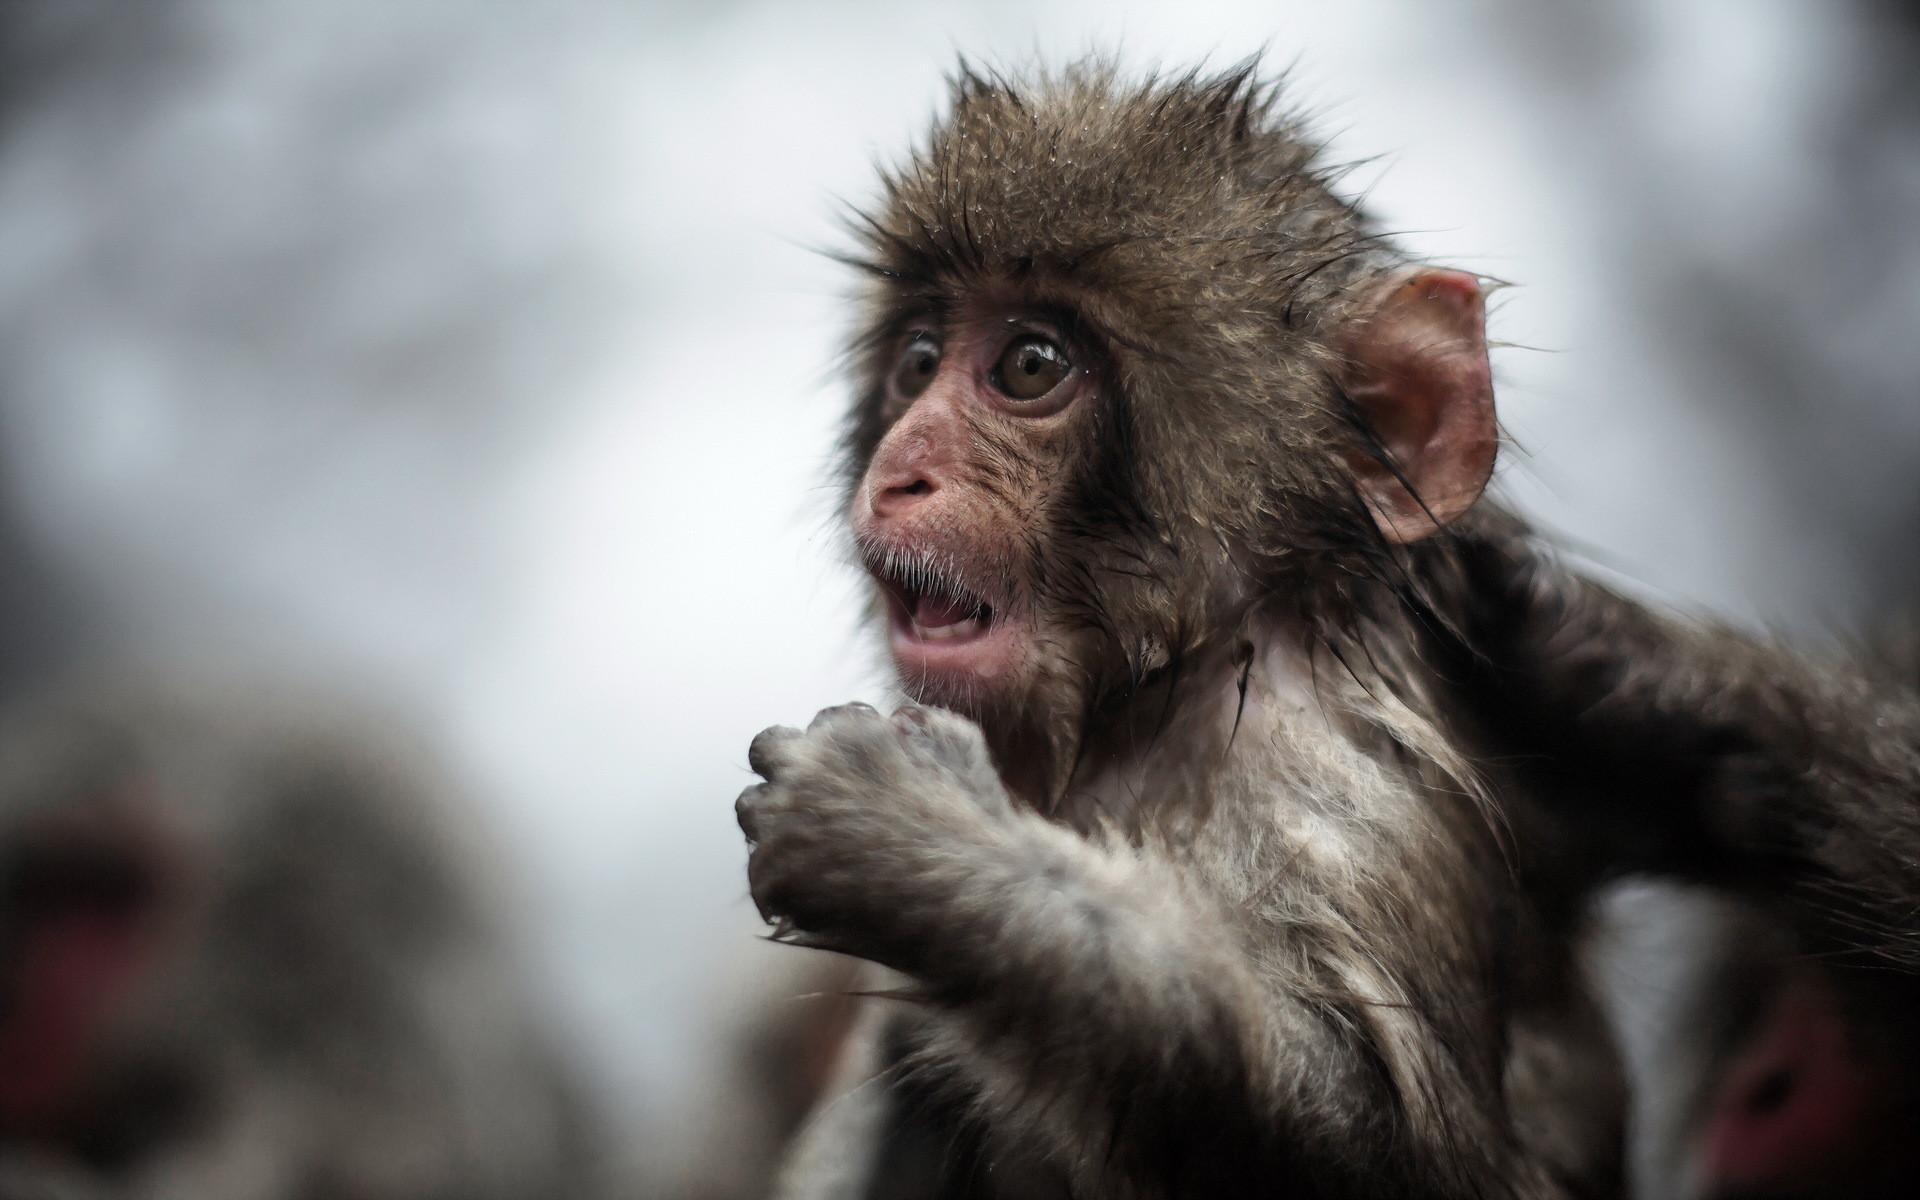 Funny Monkey Free